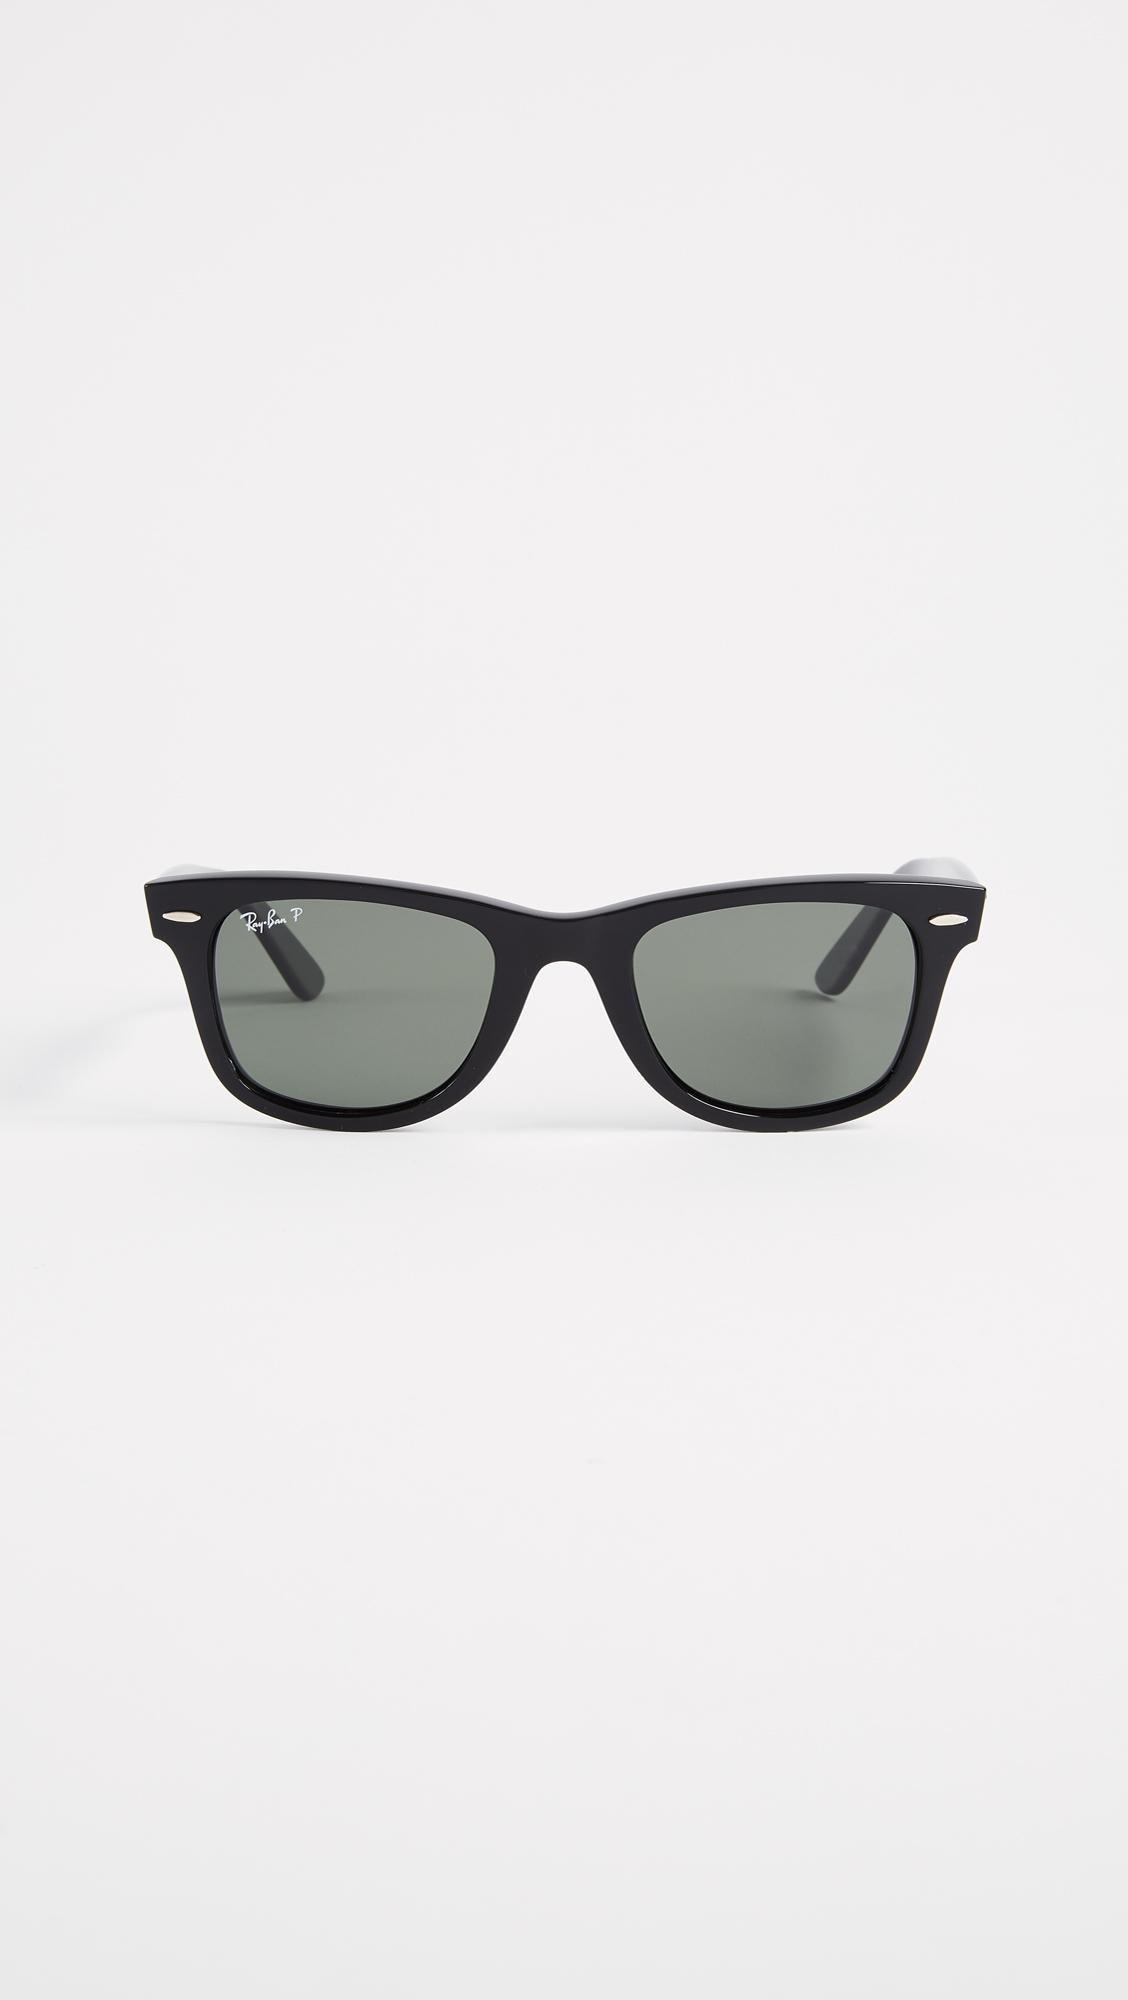 48f3fde745 Ray-Ban RB2140 Original Wayfarer Polarized Sunglasses